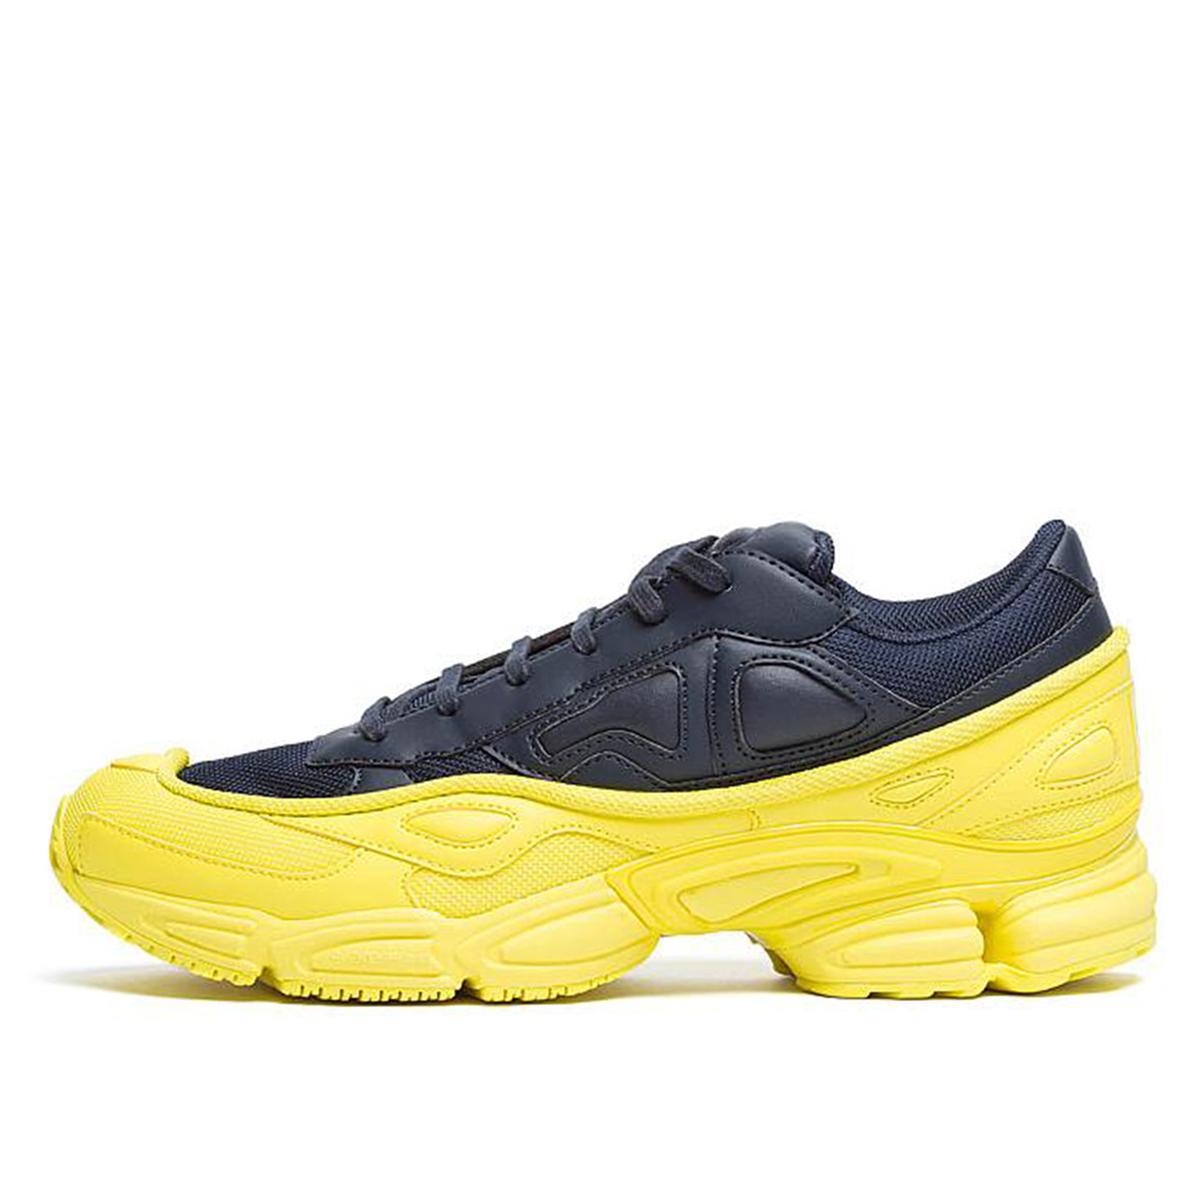 adidas x Raf Simons Ozweego Bright Yellow Night Navy